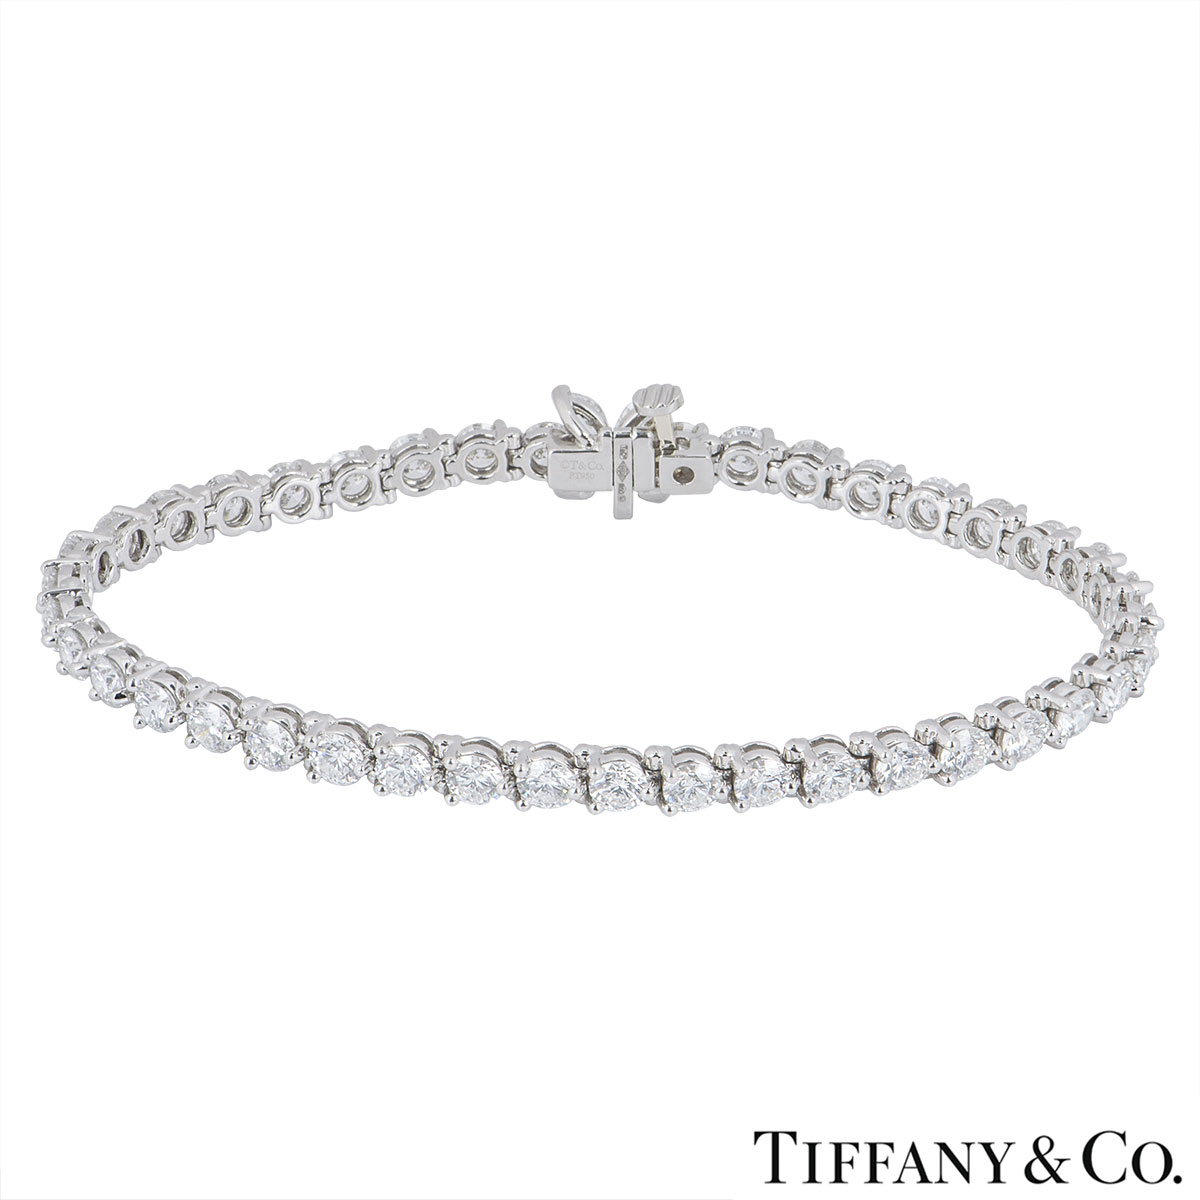 Tiffany & Co. Platinum Diamond Victoria Bracelet 6.53ct TDW